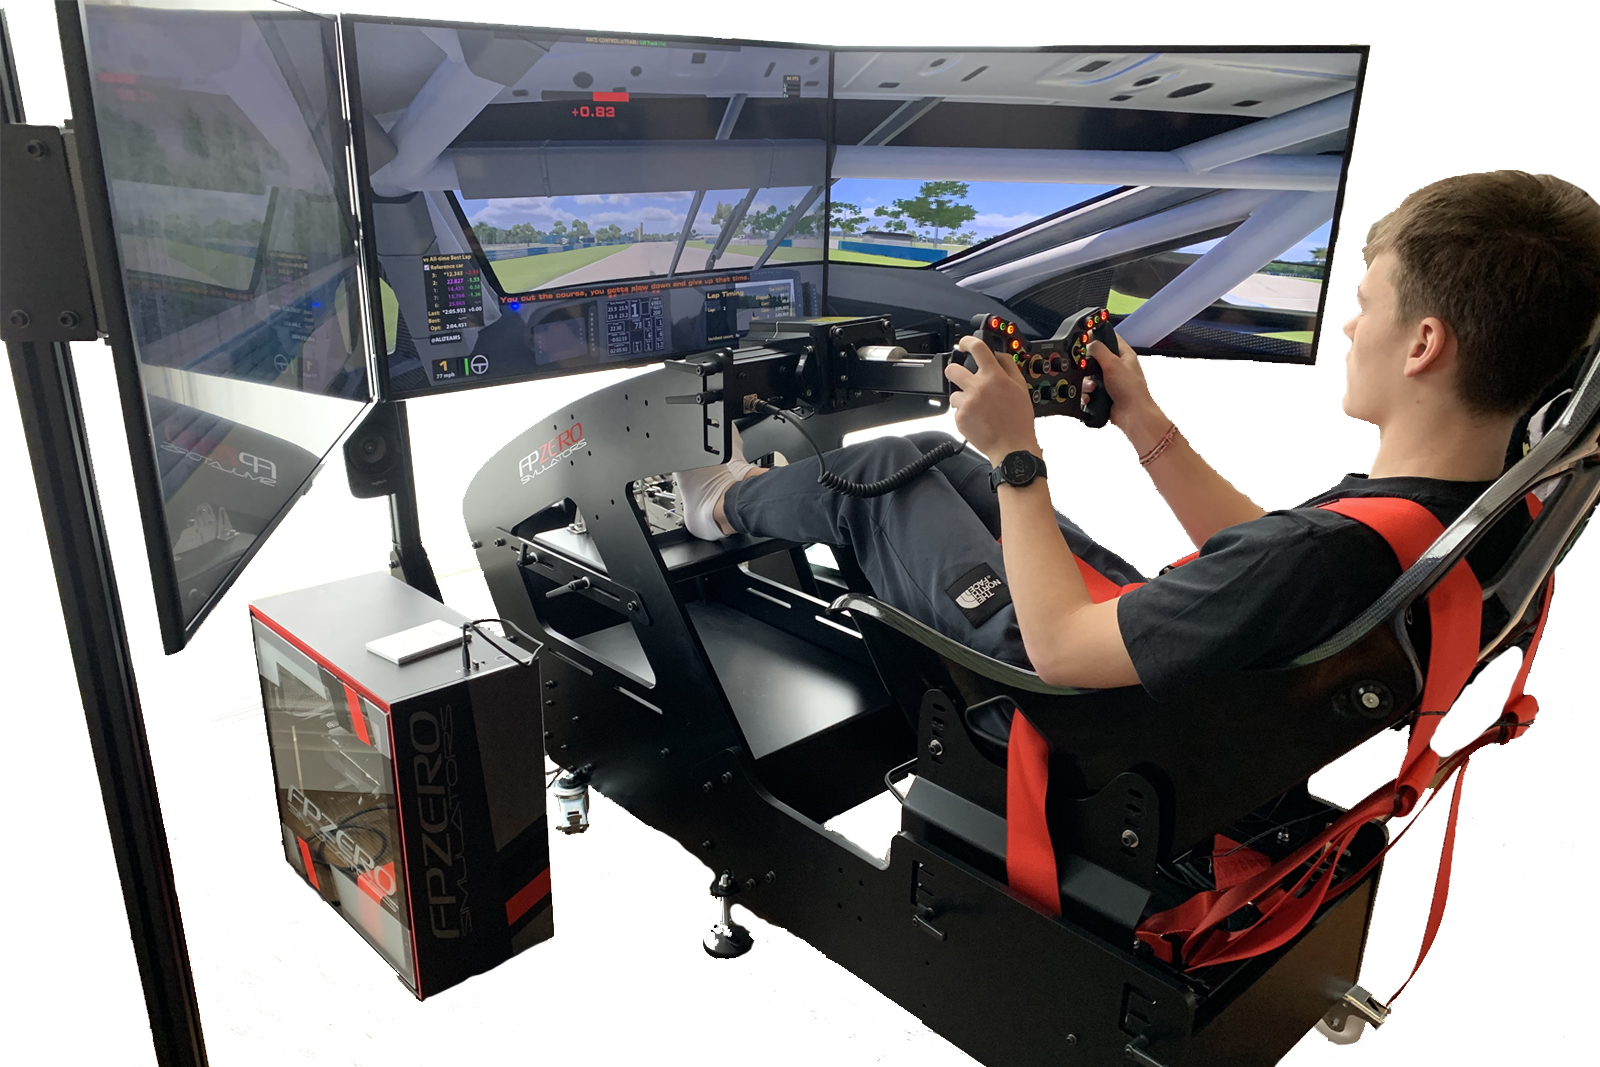 FPZERO Pro II Formula Simulator with 55 screens